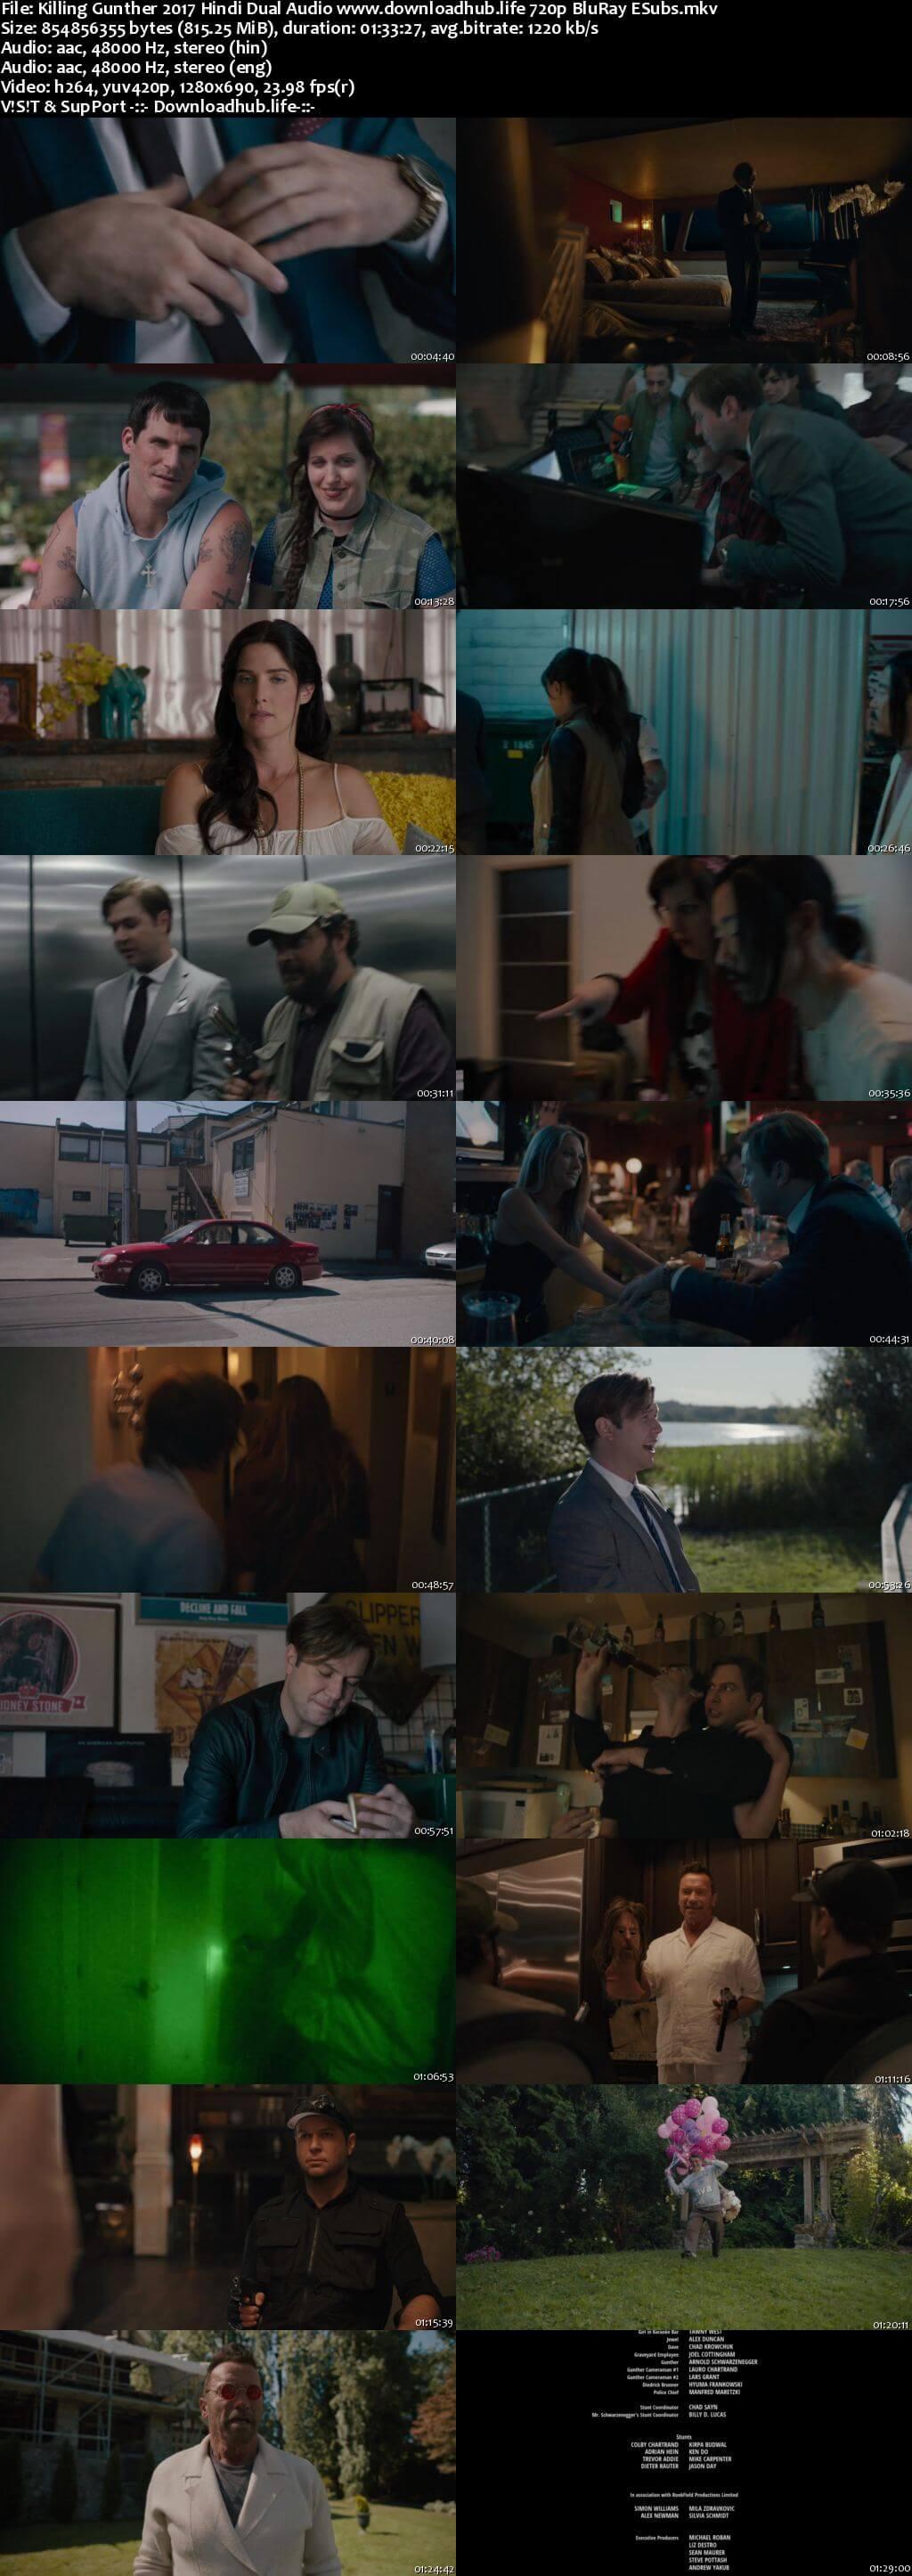 Killing Gunther 2017 Hindi Dual Audio 720p BluRay ESubs